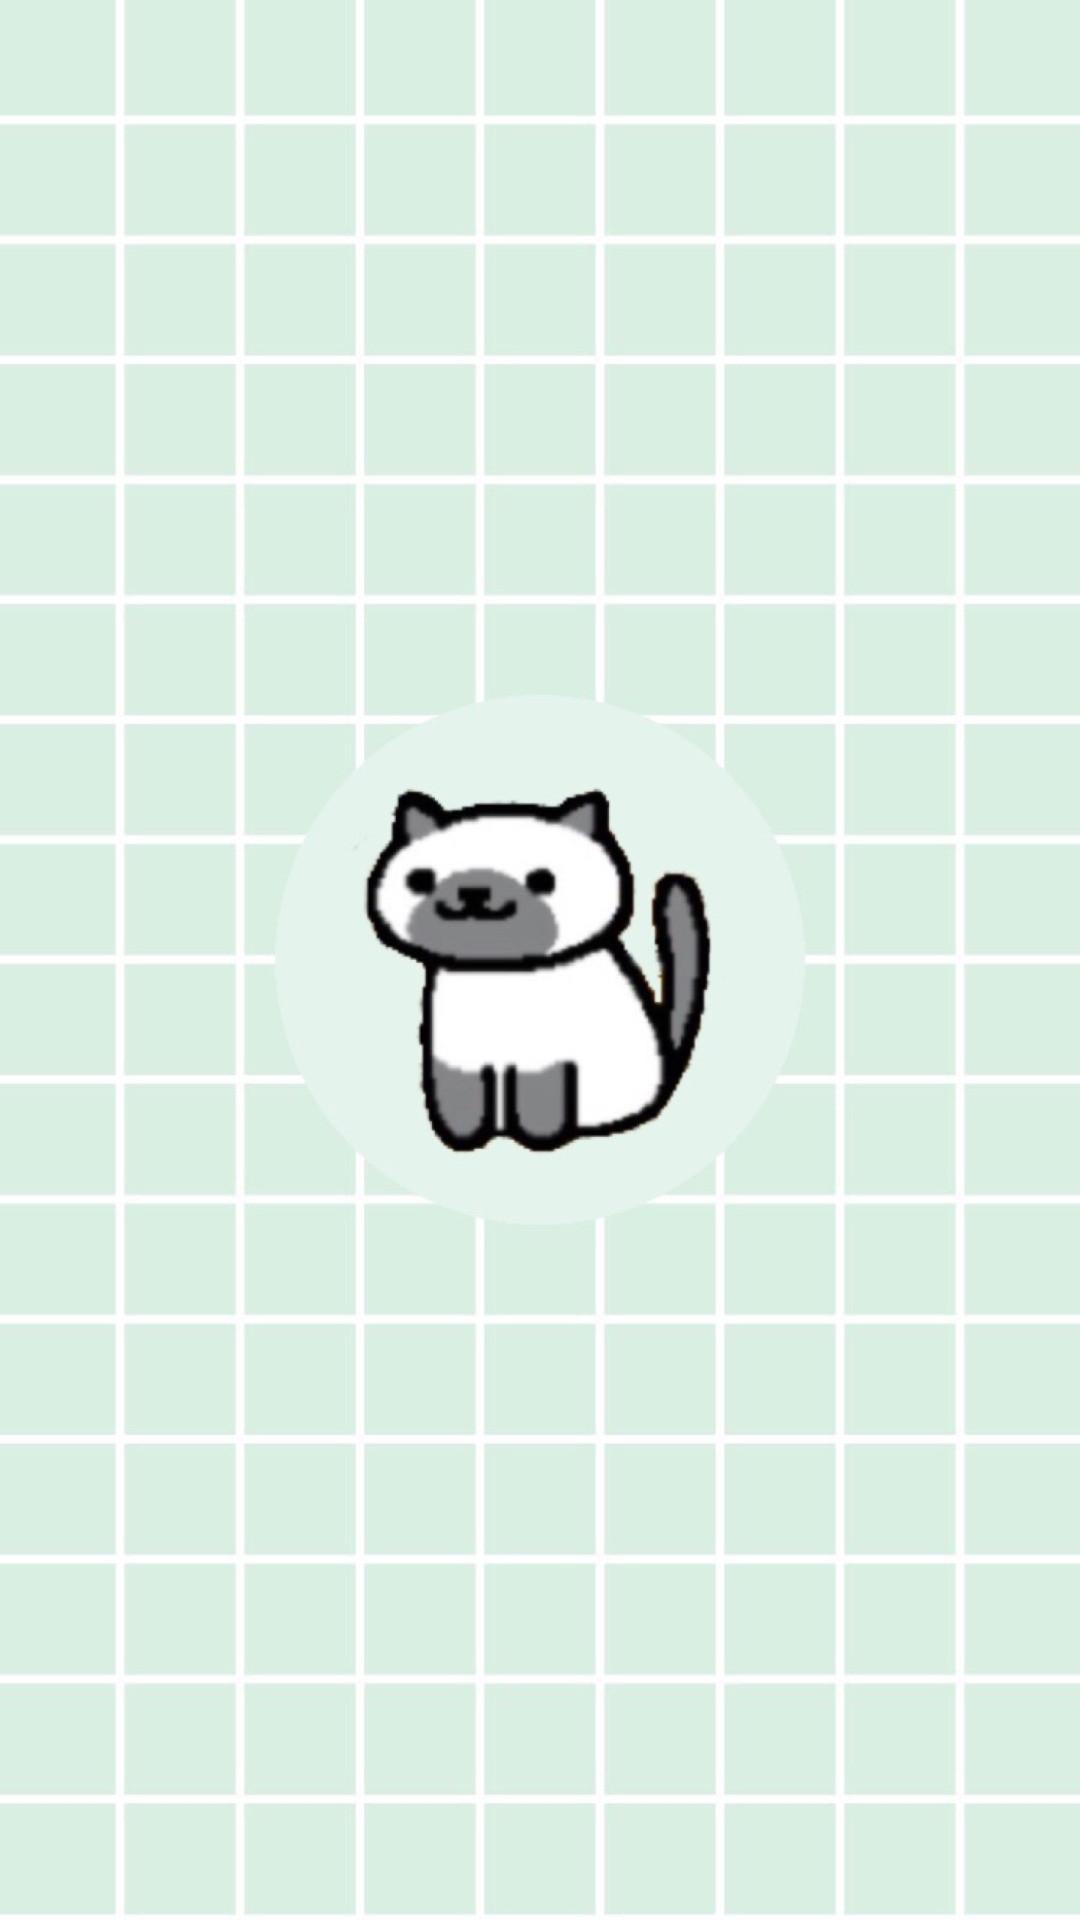 Cute Neko Atsume. Tap to see more Neko Atsume the cat wallpapers,  backgrounds,